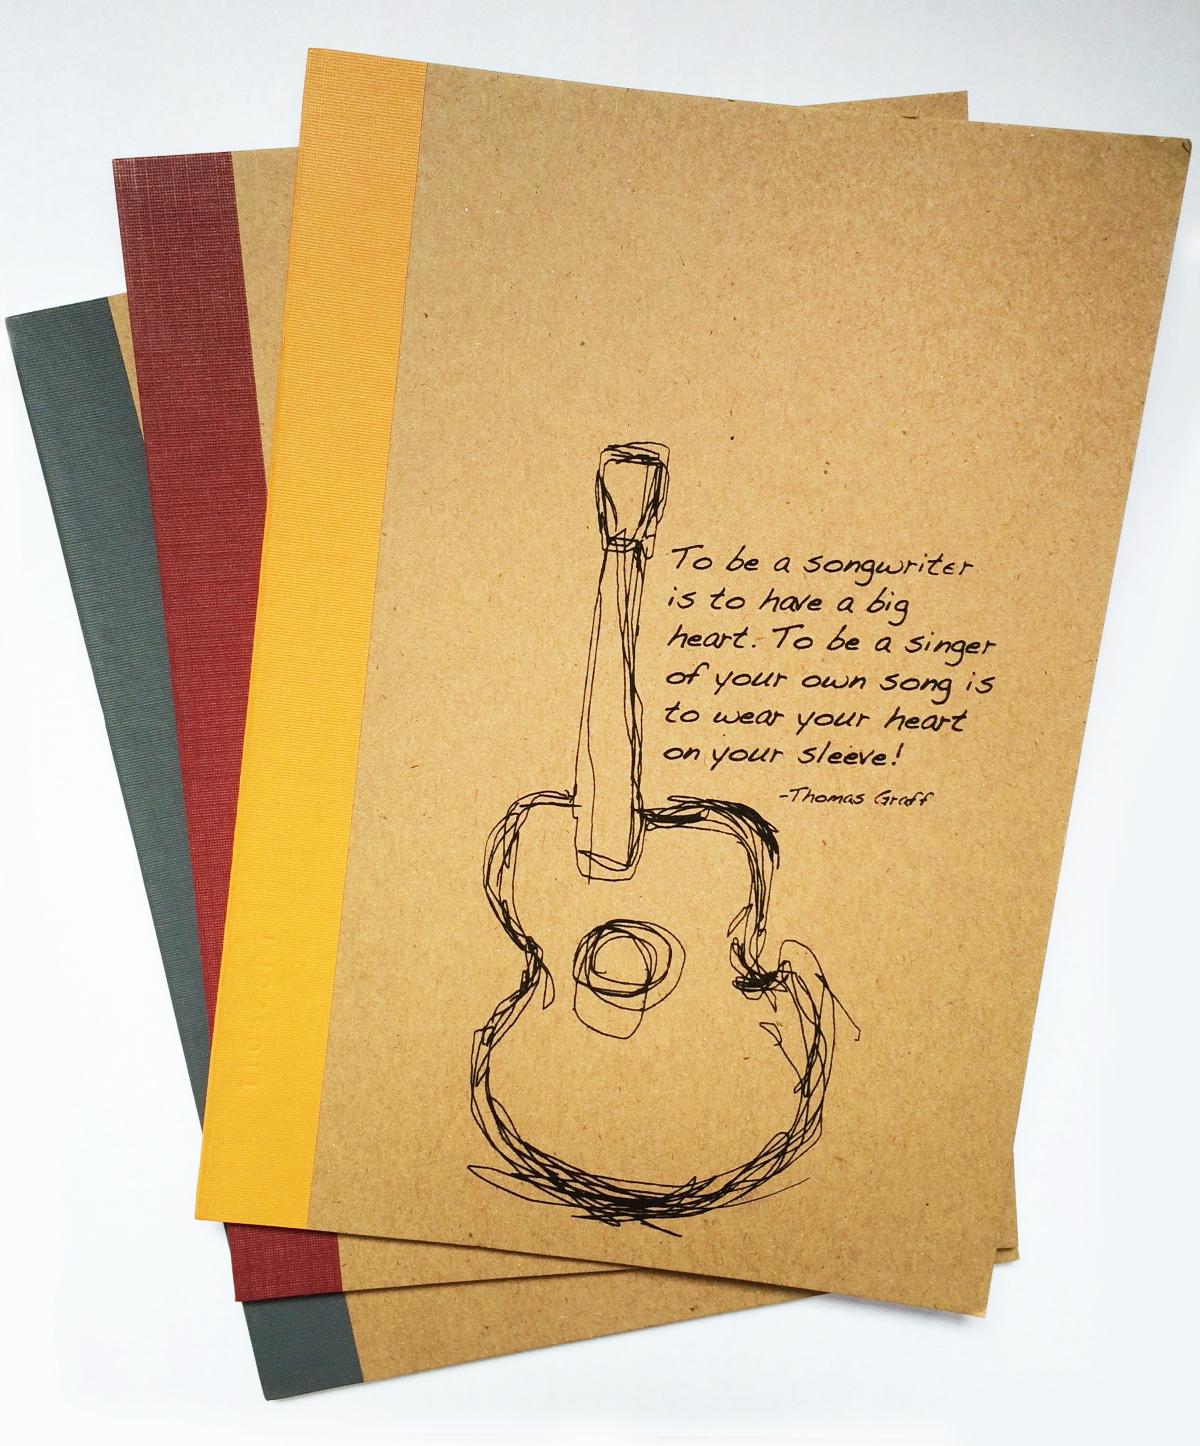 DESIGN 2: Vivid Guitar with Quote